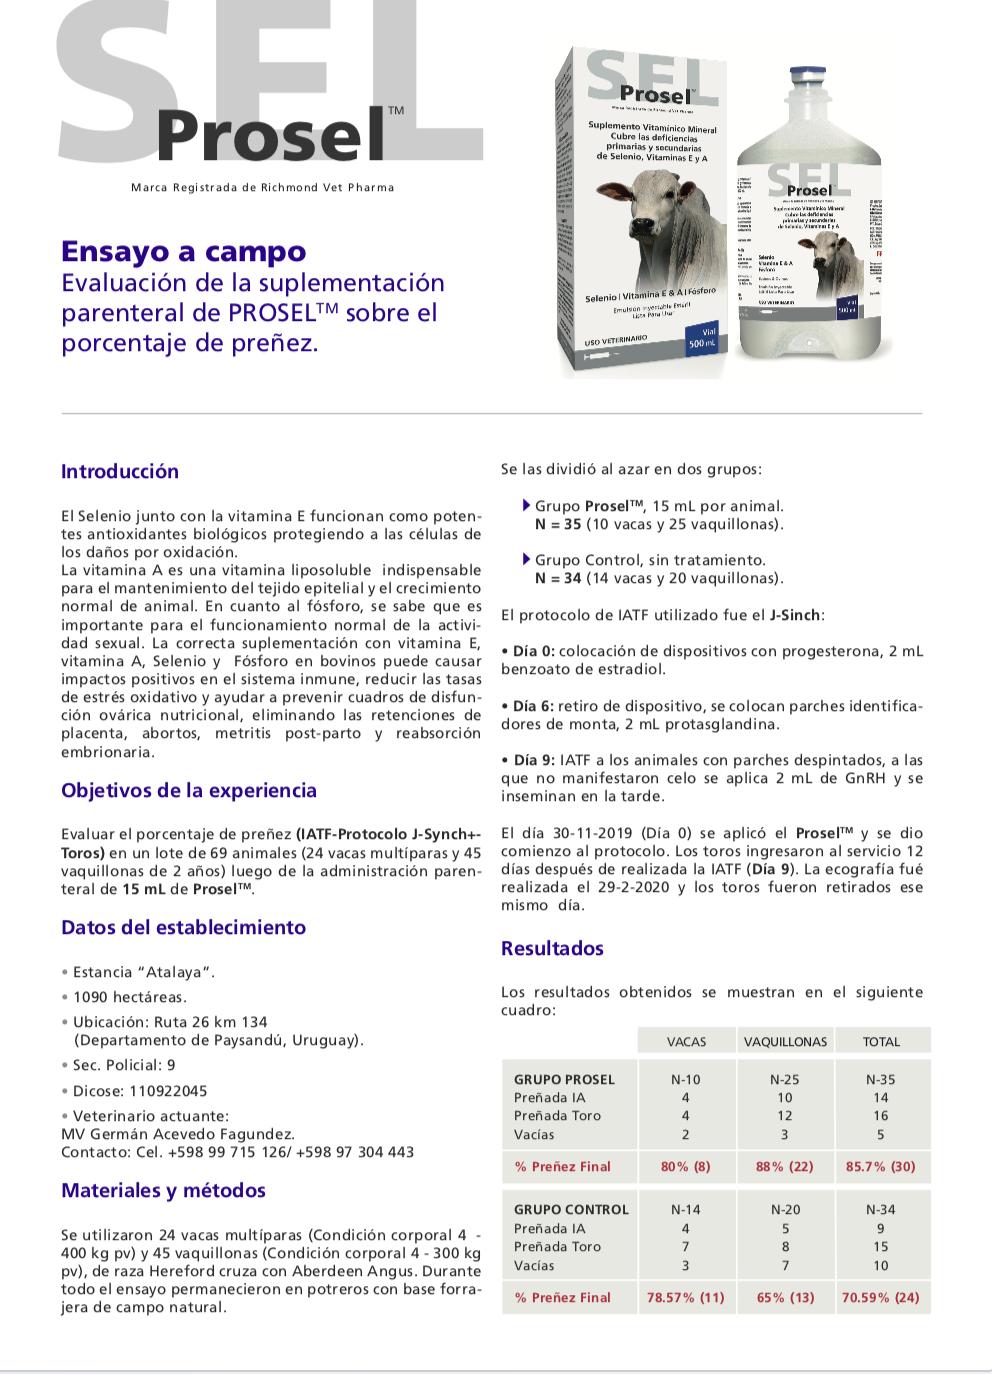 Informe Técnico Prosel